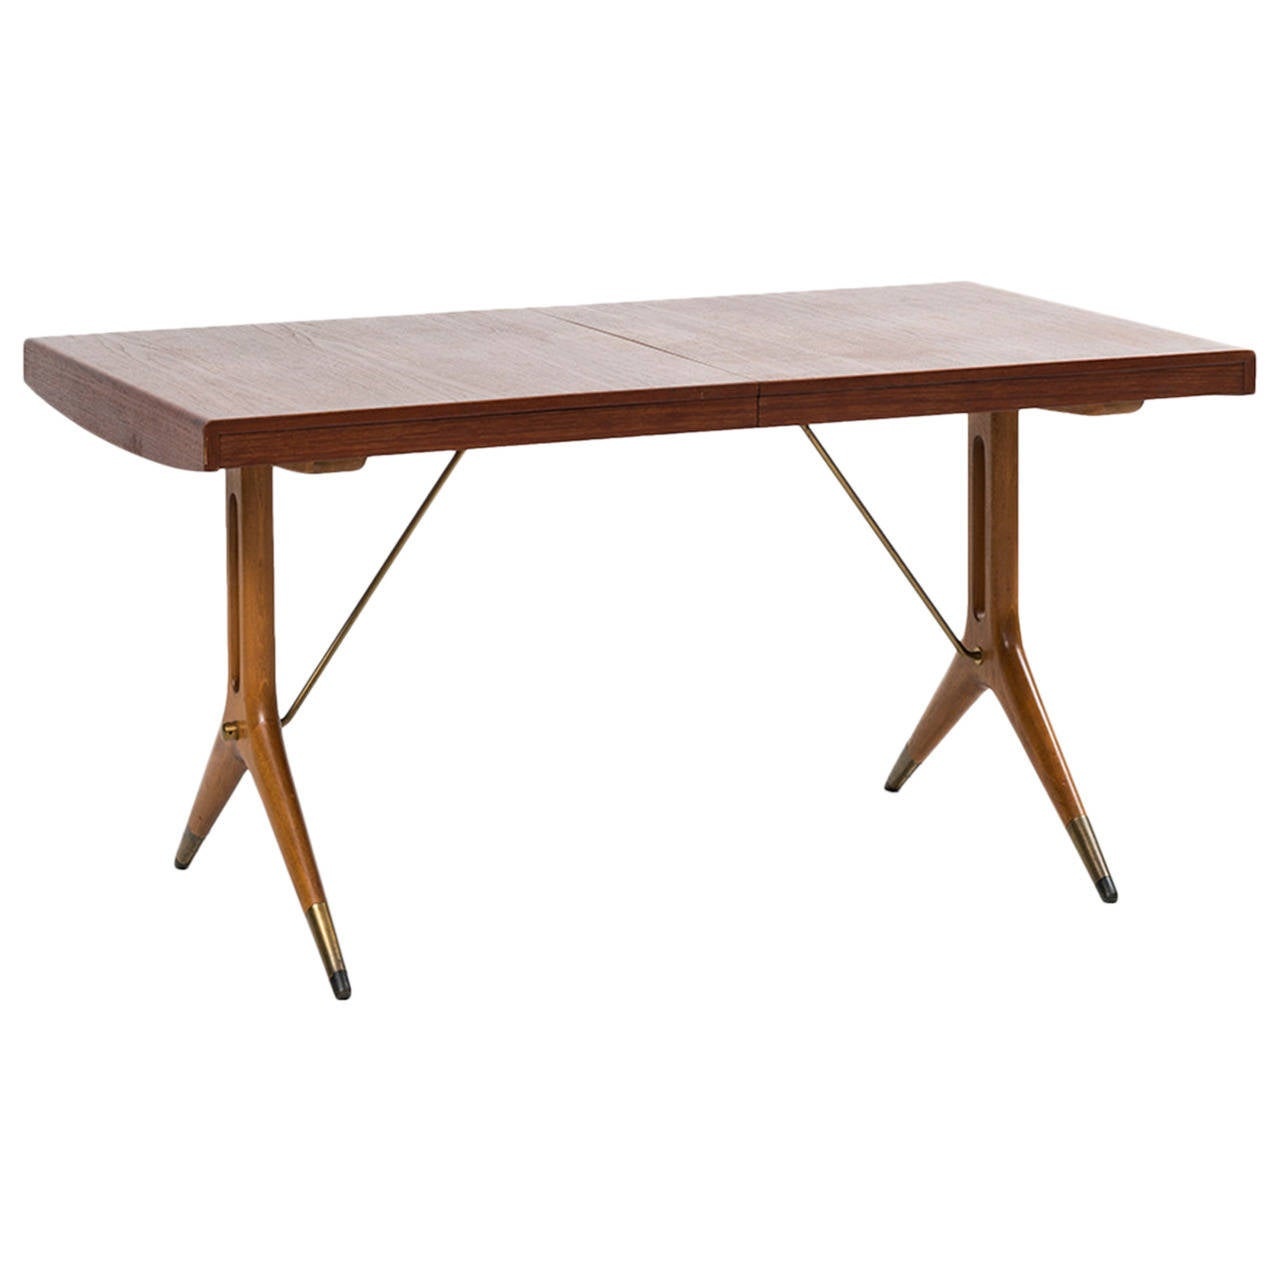 David Rosén Napoli Dining Table by Nordiska Kompaniet in Sweden